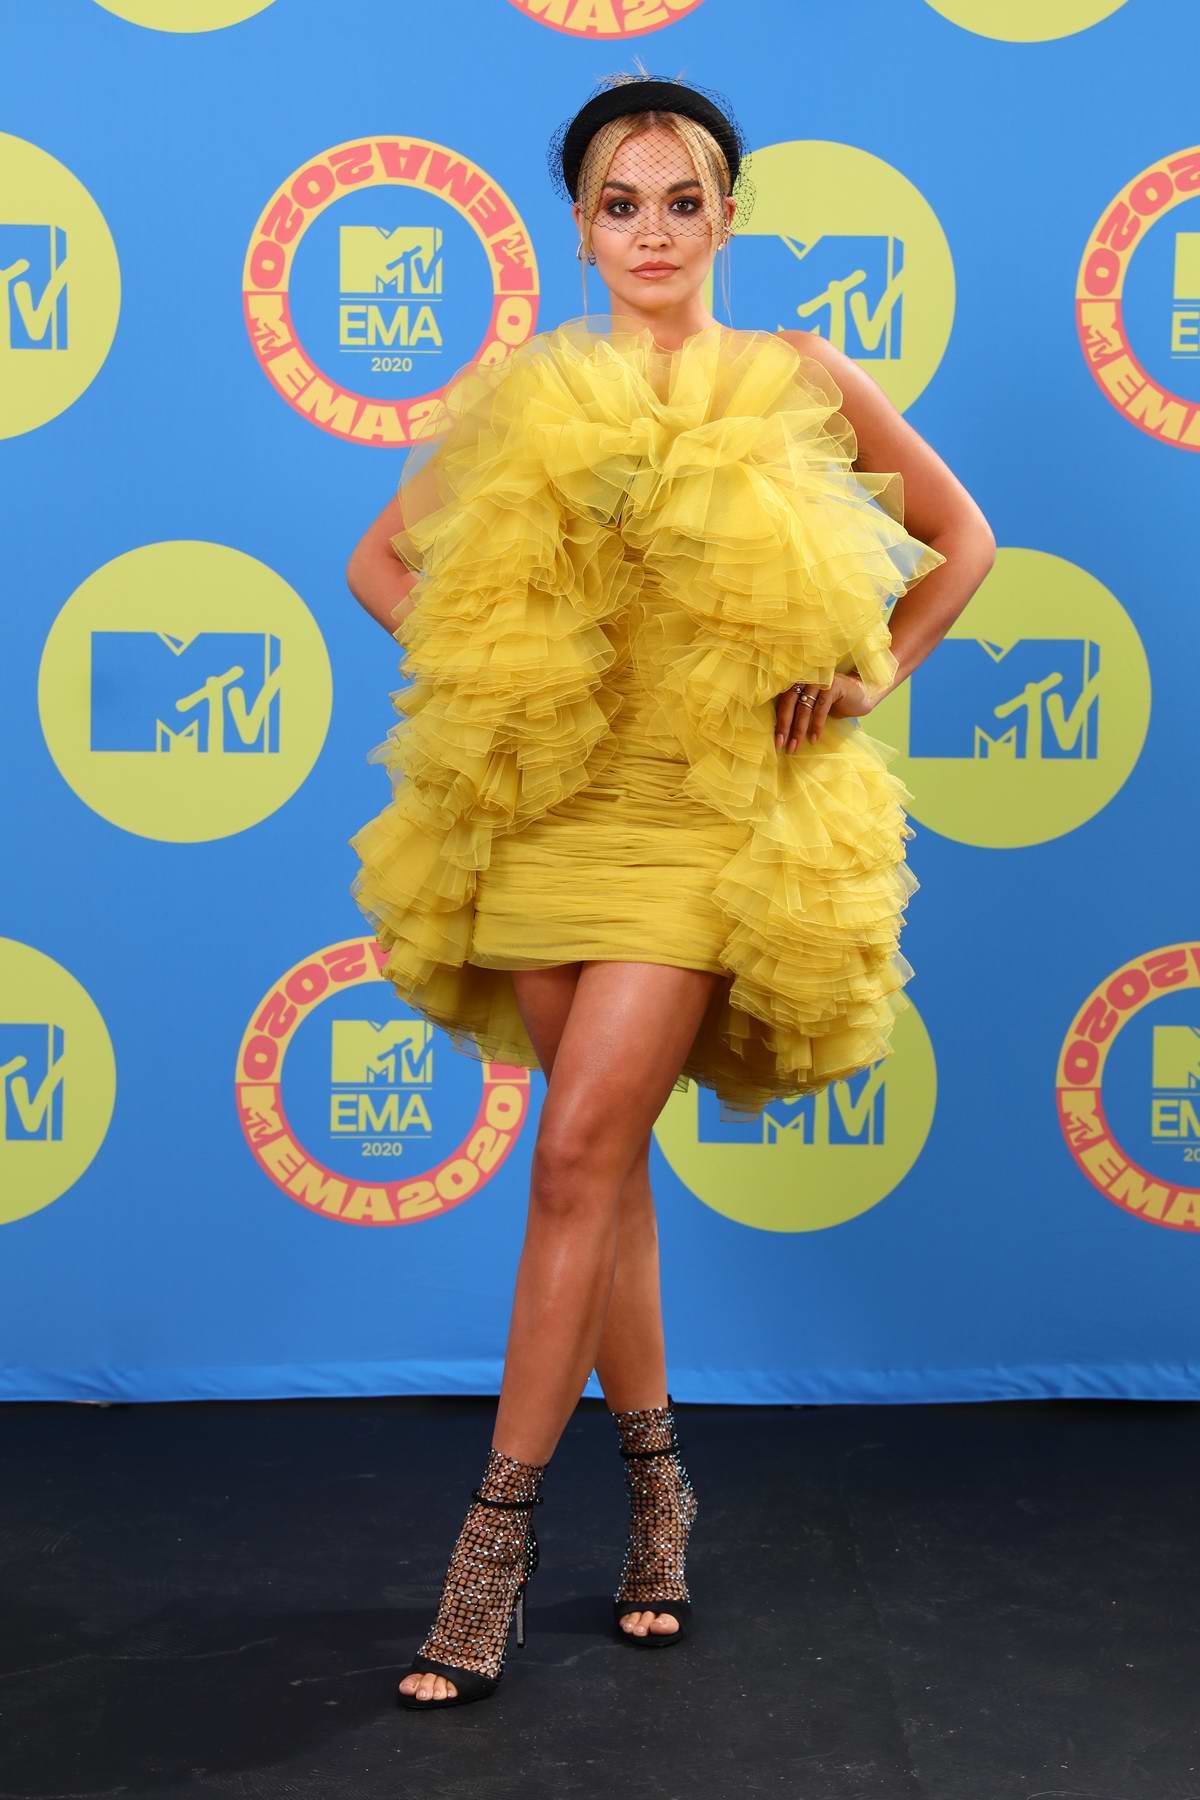 Rita Ora attends the 2020 MTV European Music Awards (MTV EMAs 2020) in London, UK